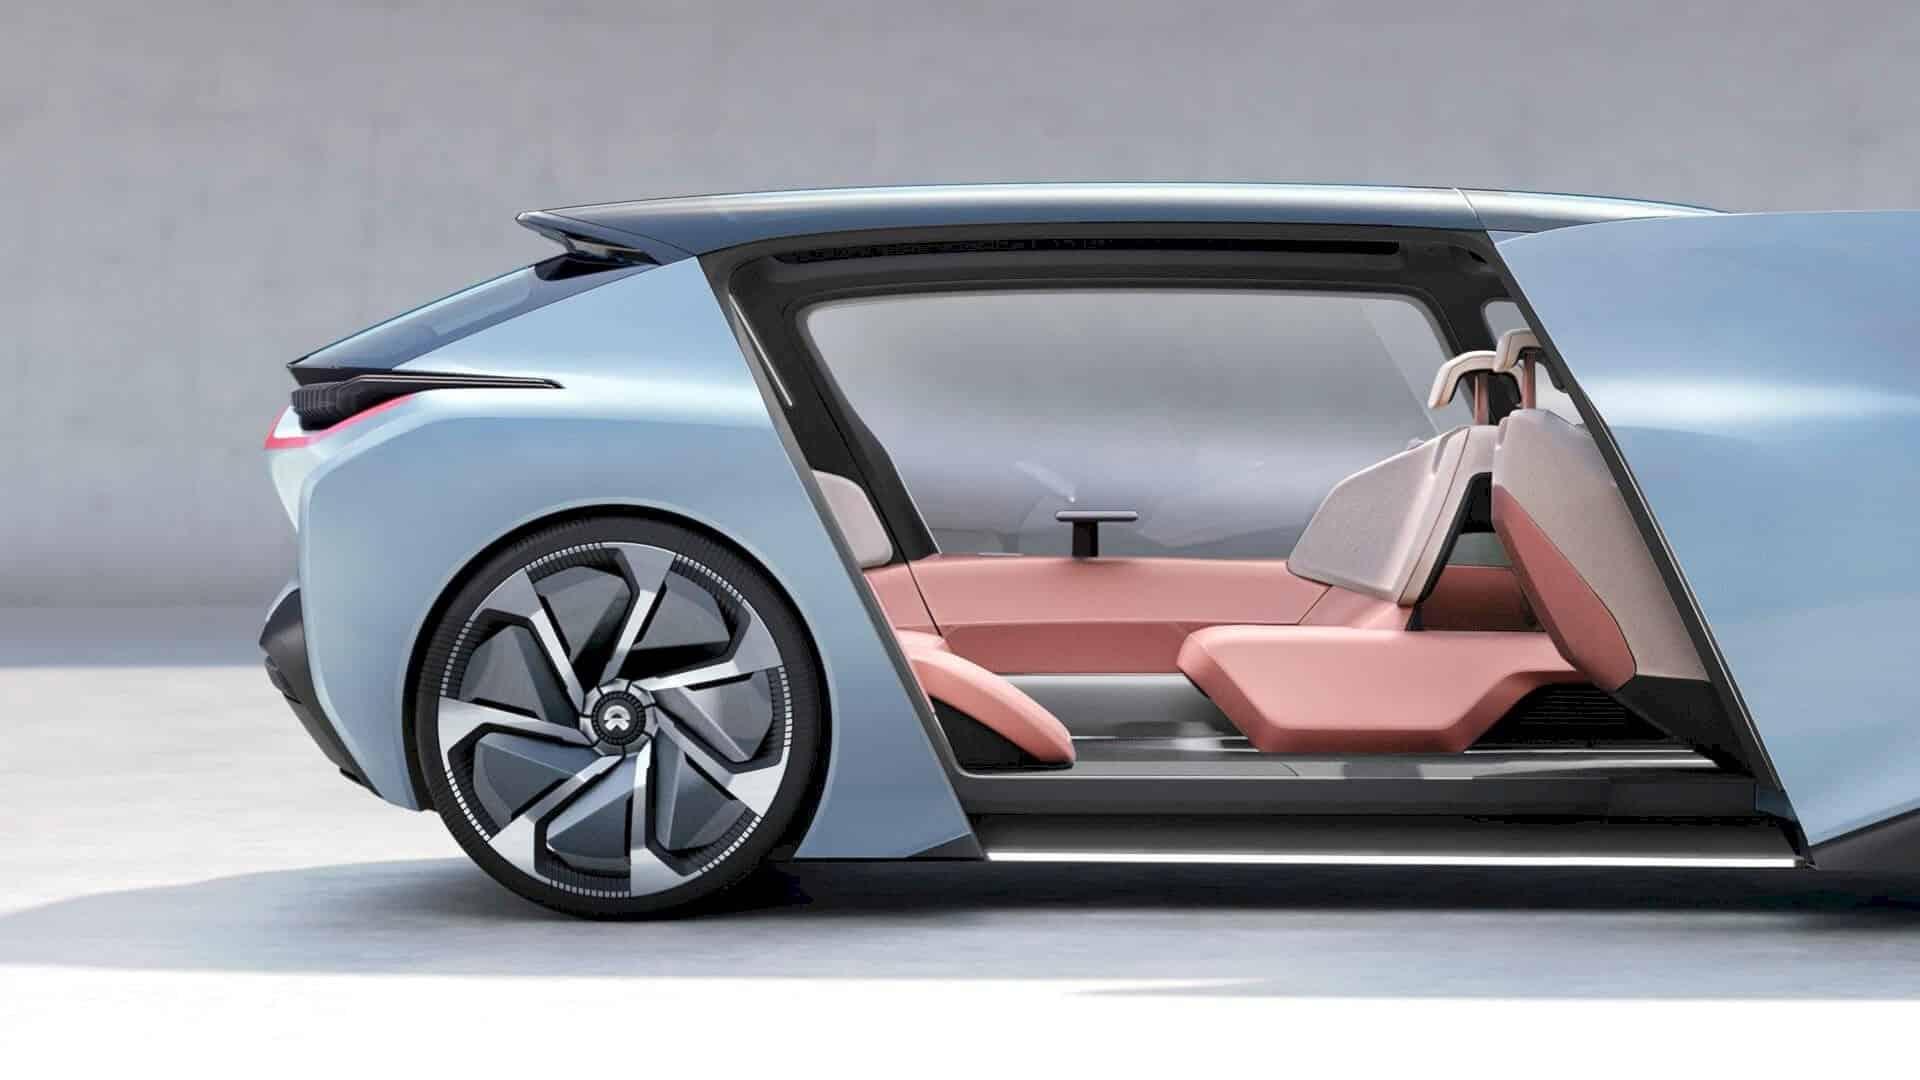 Nio Eve: The Vision of the Future